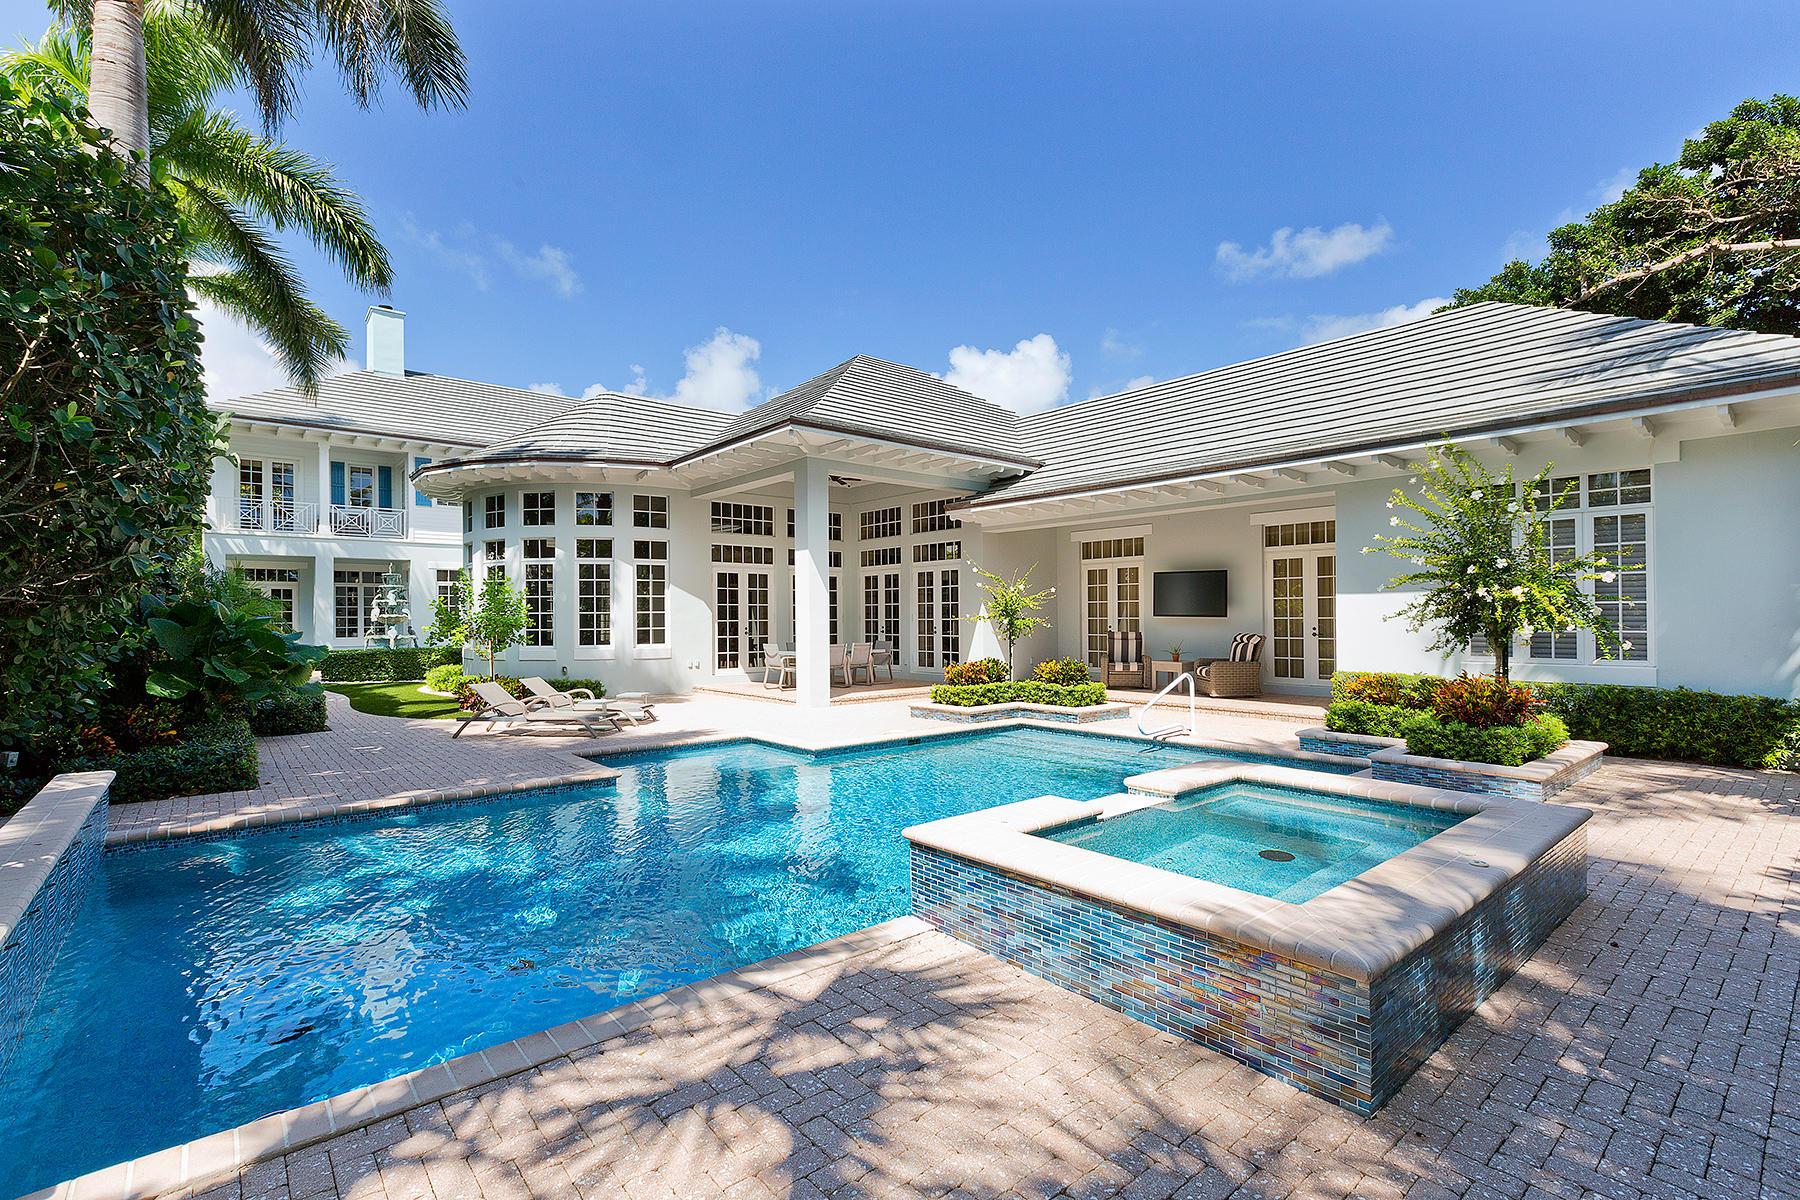 455 Andrews Avenue, Delray Beach, Florida 33483, 4 Bedrooms Bedrooms, ,4.1 BathroomsBathrooms,Single Family,For Sale,Andrews,RX-10477282